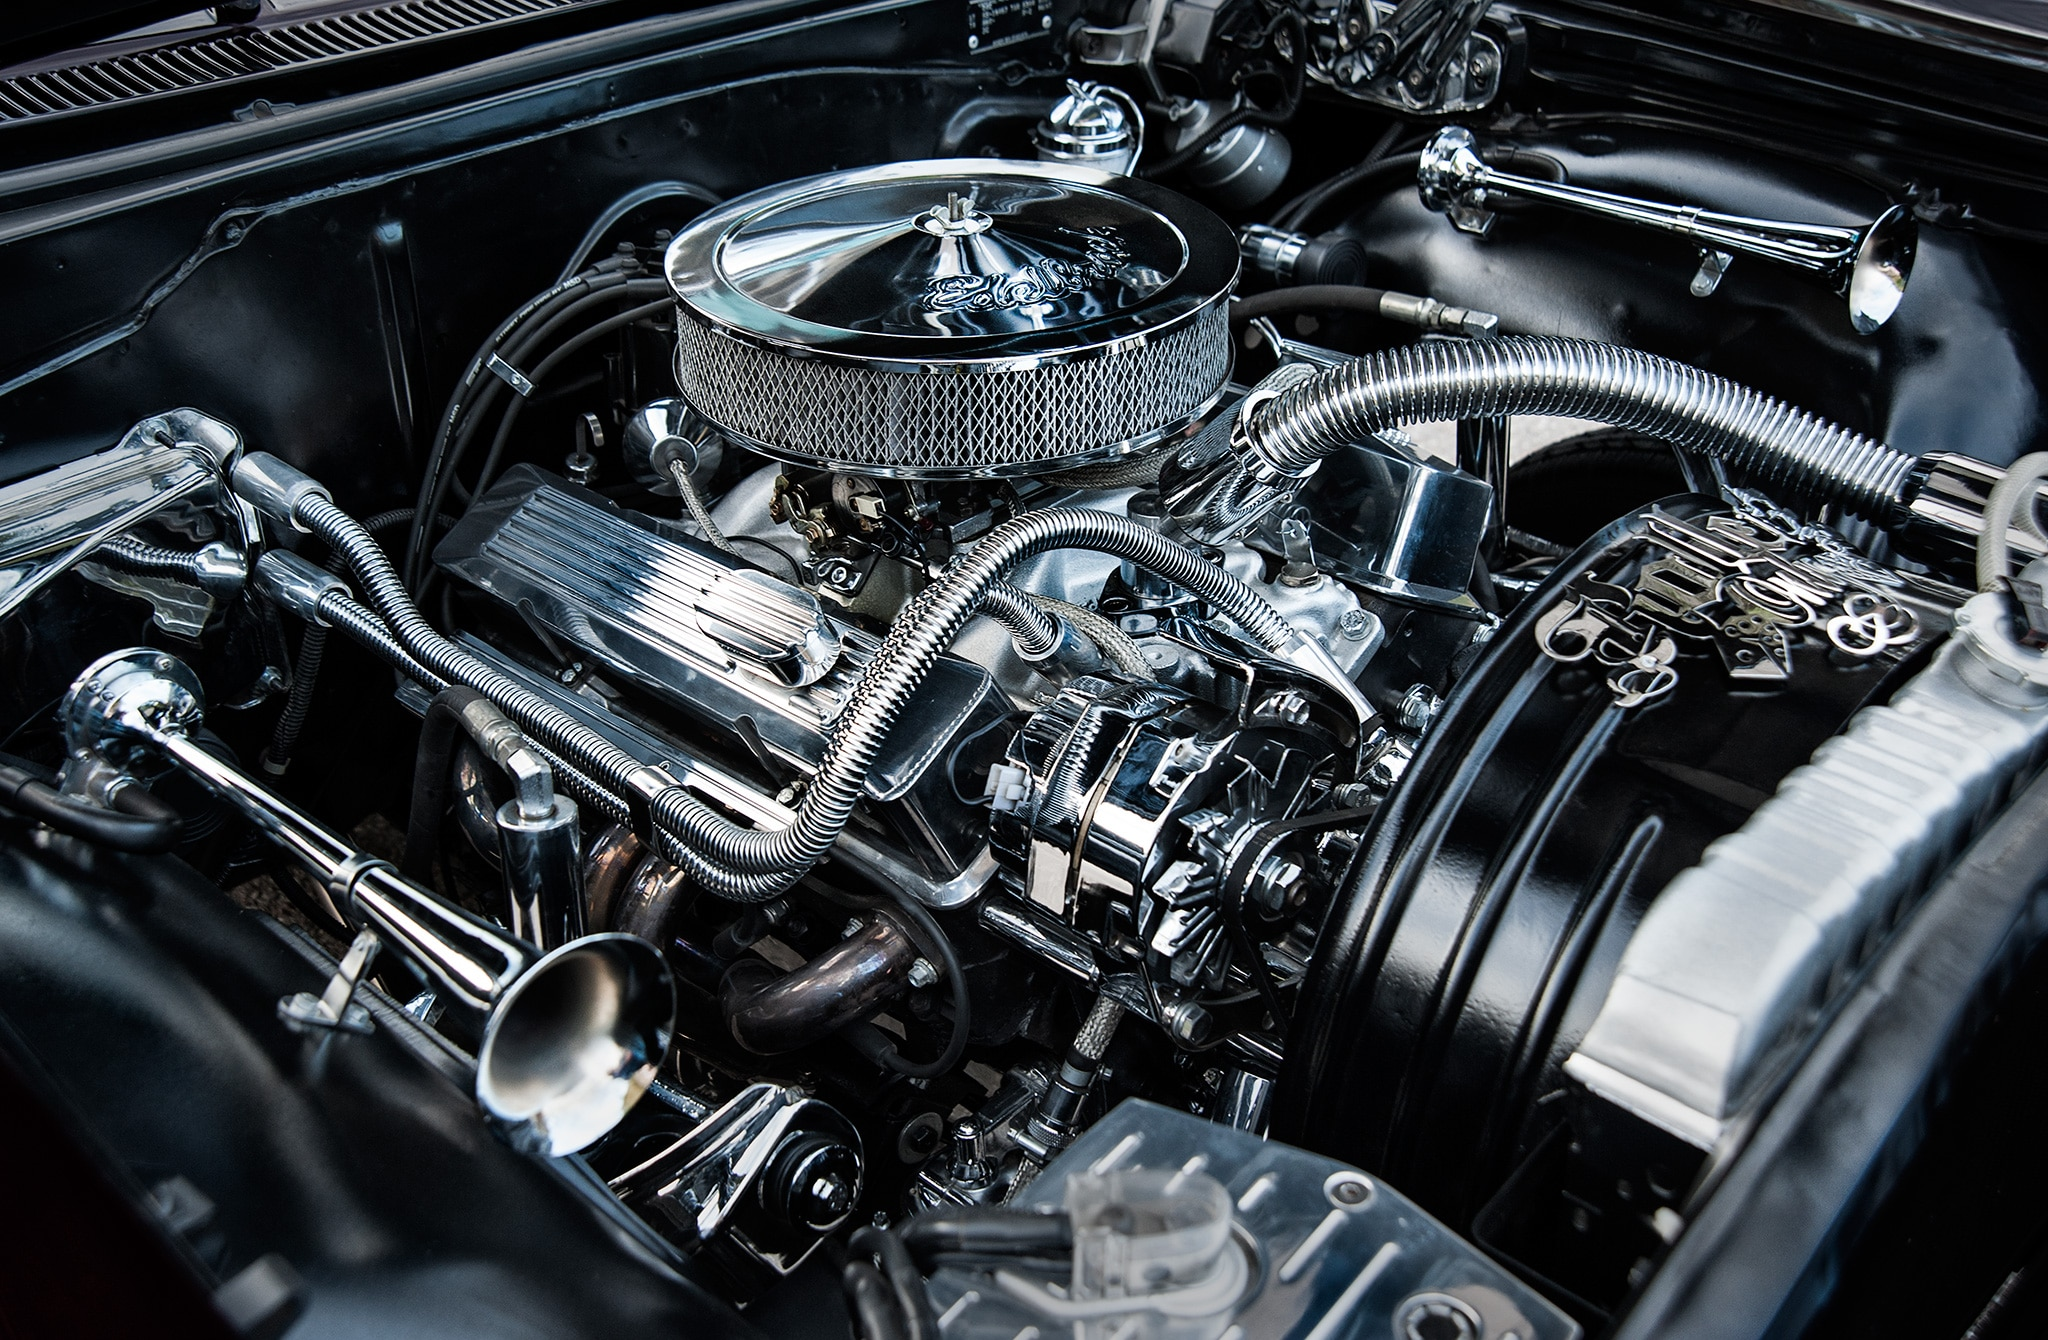 2000 chevy impala engine bay wiring diagram 2000 chevy impala fuel pump wiring diagram 3 8 impala motor impremedia net